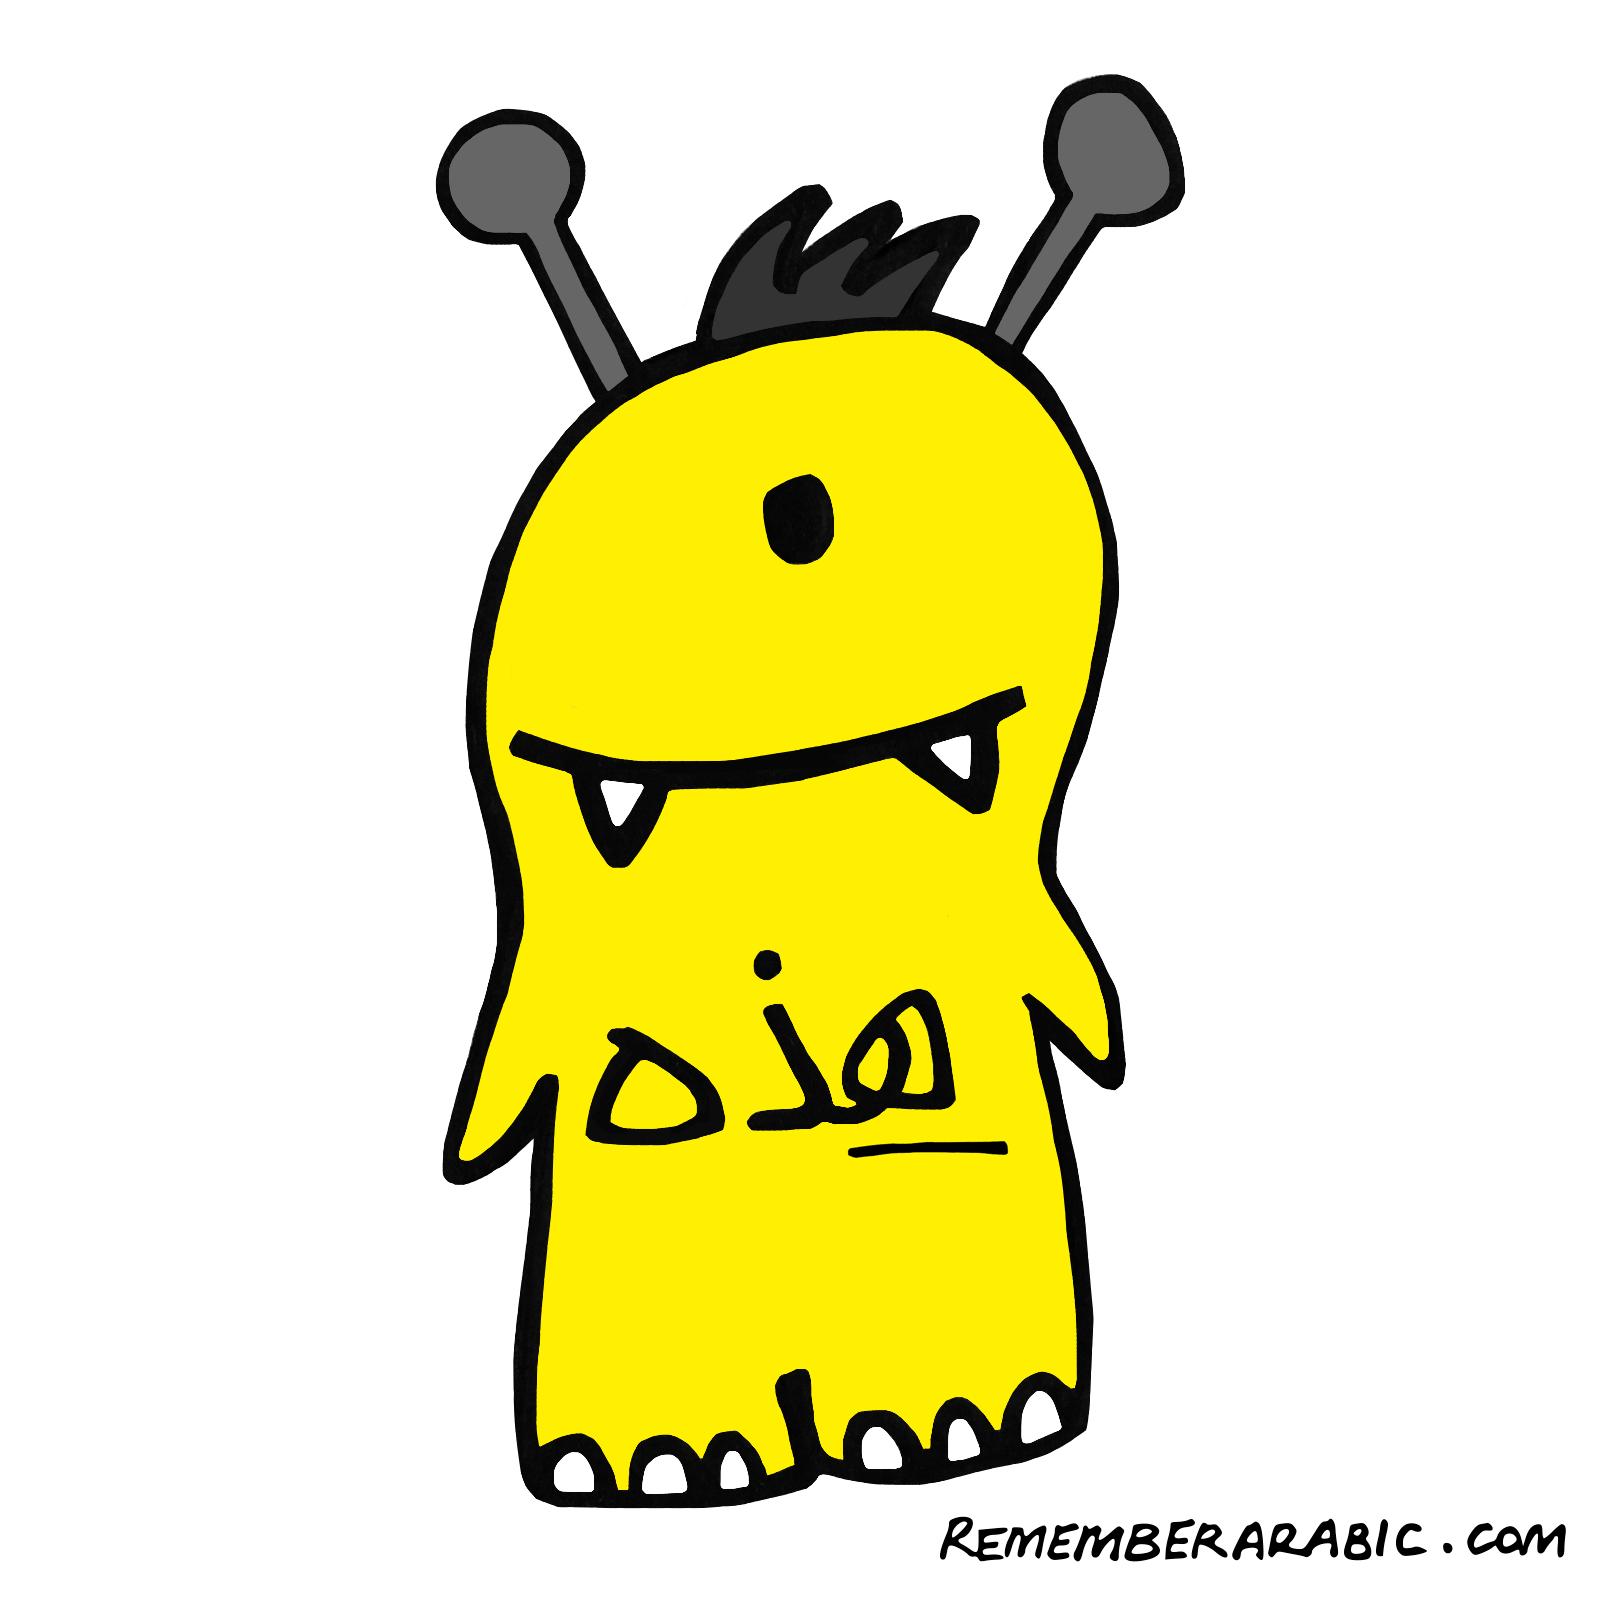 Fig. 5 Haa-theehee [singular, near, feminine]